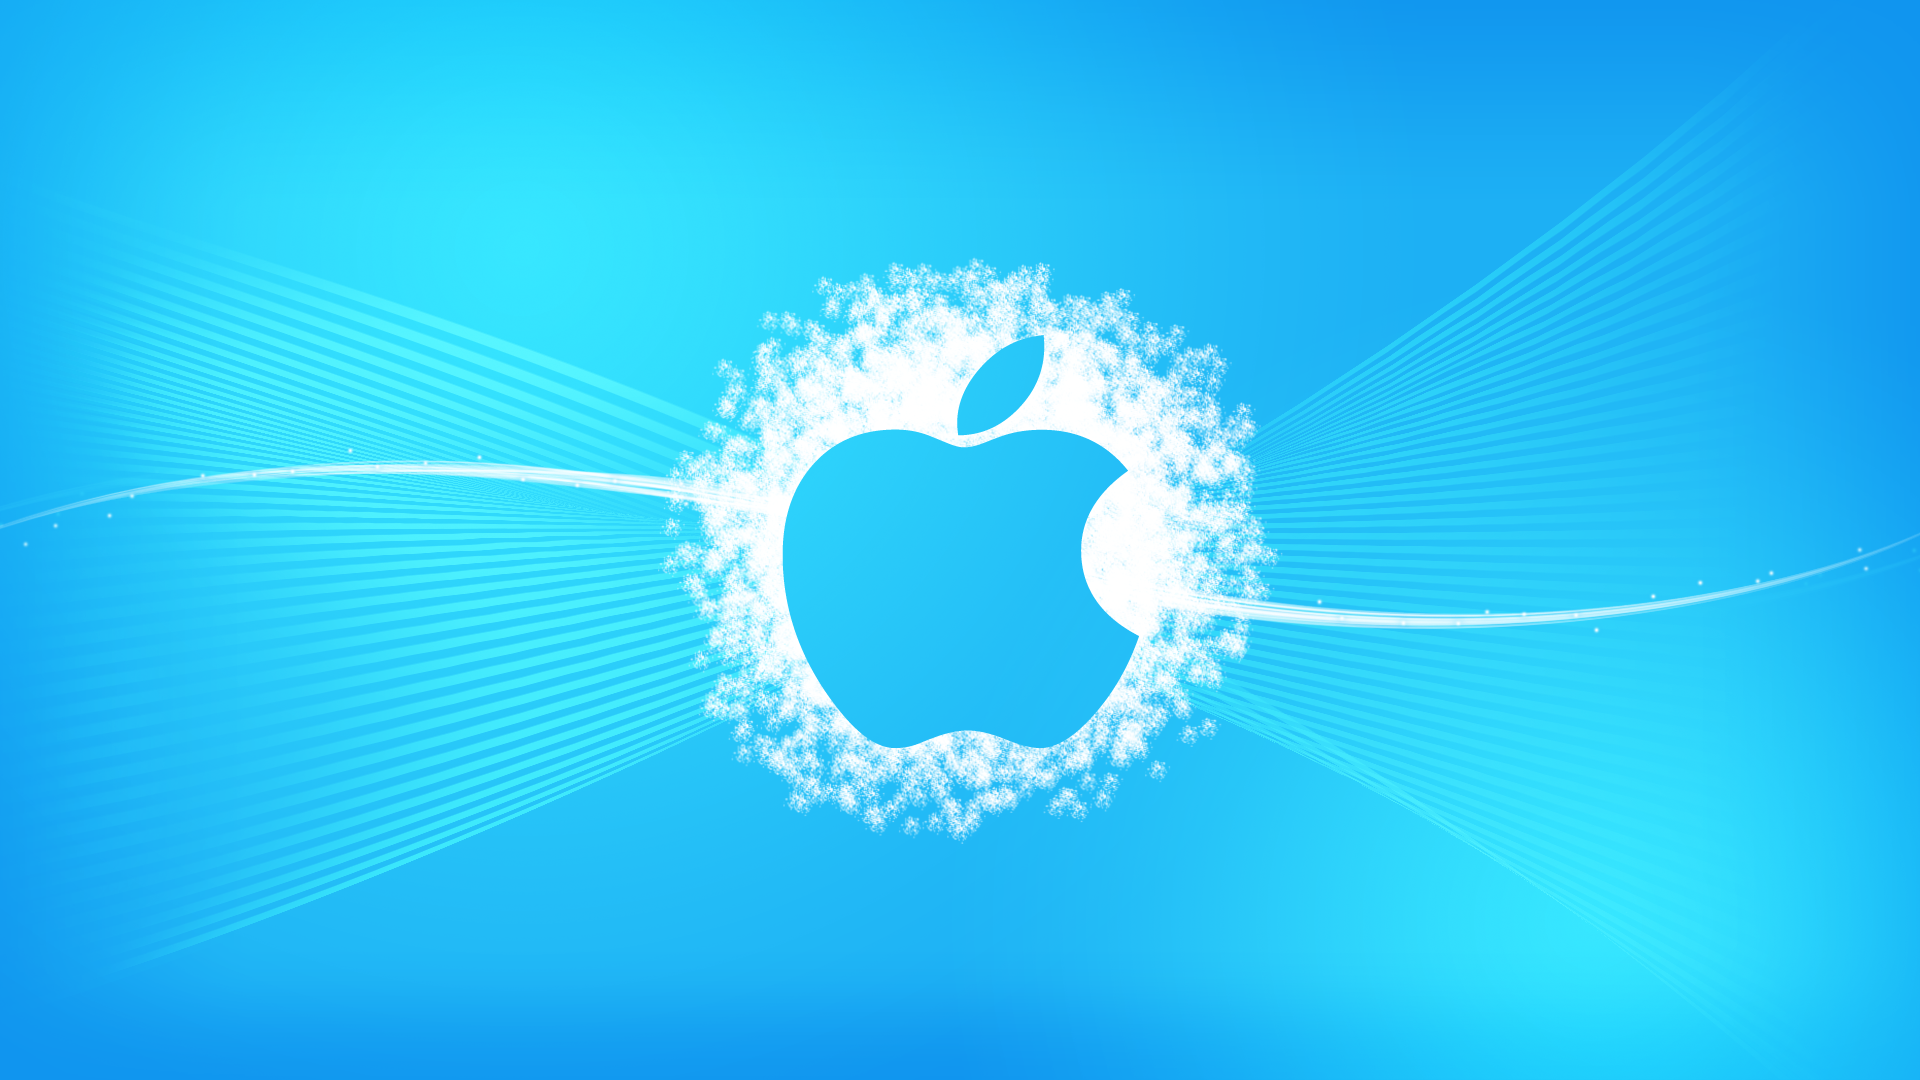 apple logo lg g wallpapers hd lg g wallpapers lg wallpapers | hd